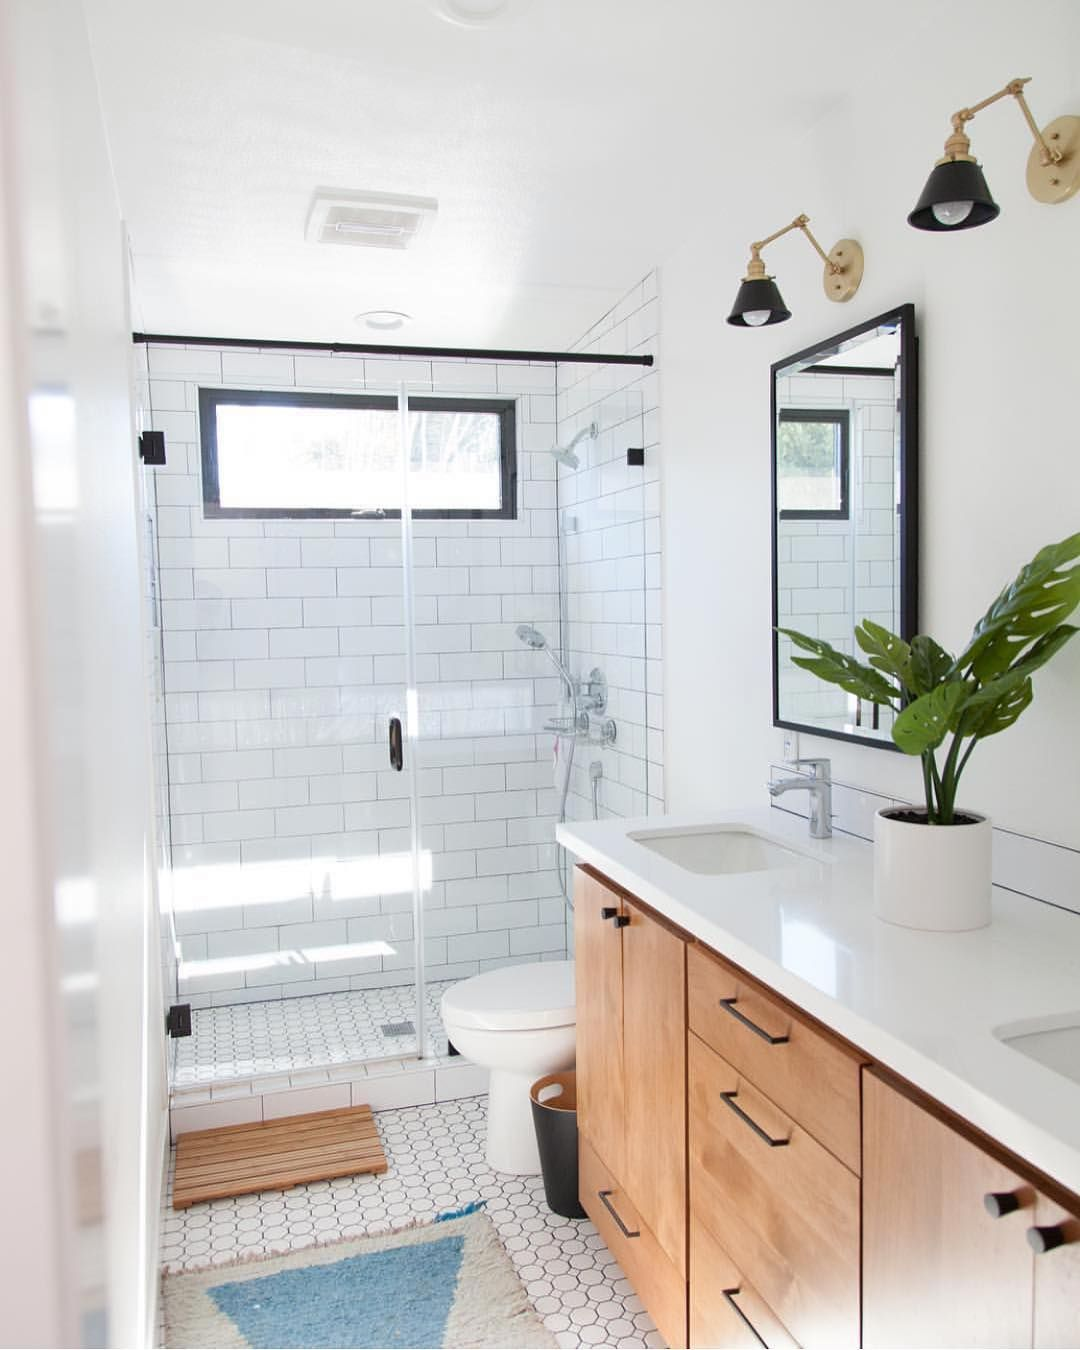 Bathrooms Of Instagram On Instagram Bathroom Transformation Shout Out By Casamochi Photo Allisonrichterpho Vanity Design Bathrooms Remodel Wood Vanity